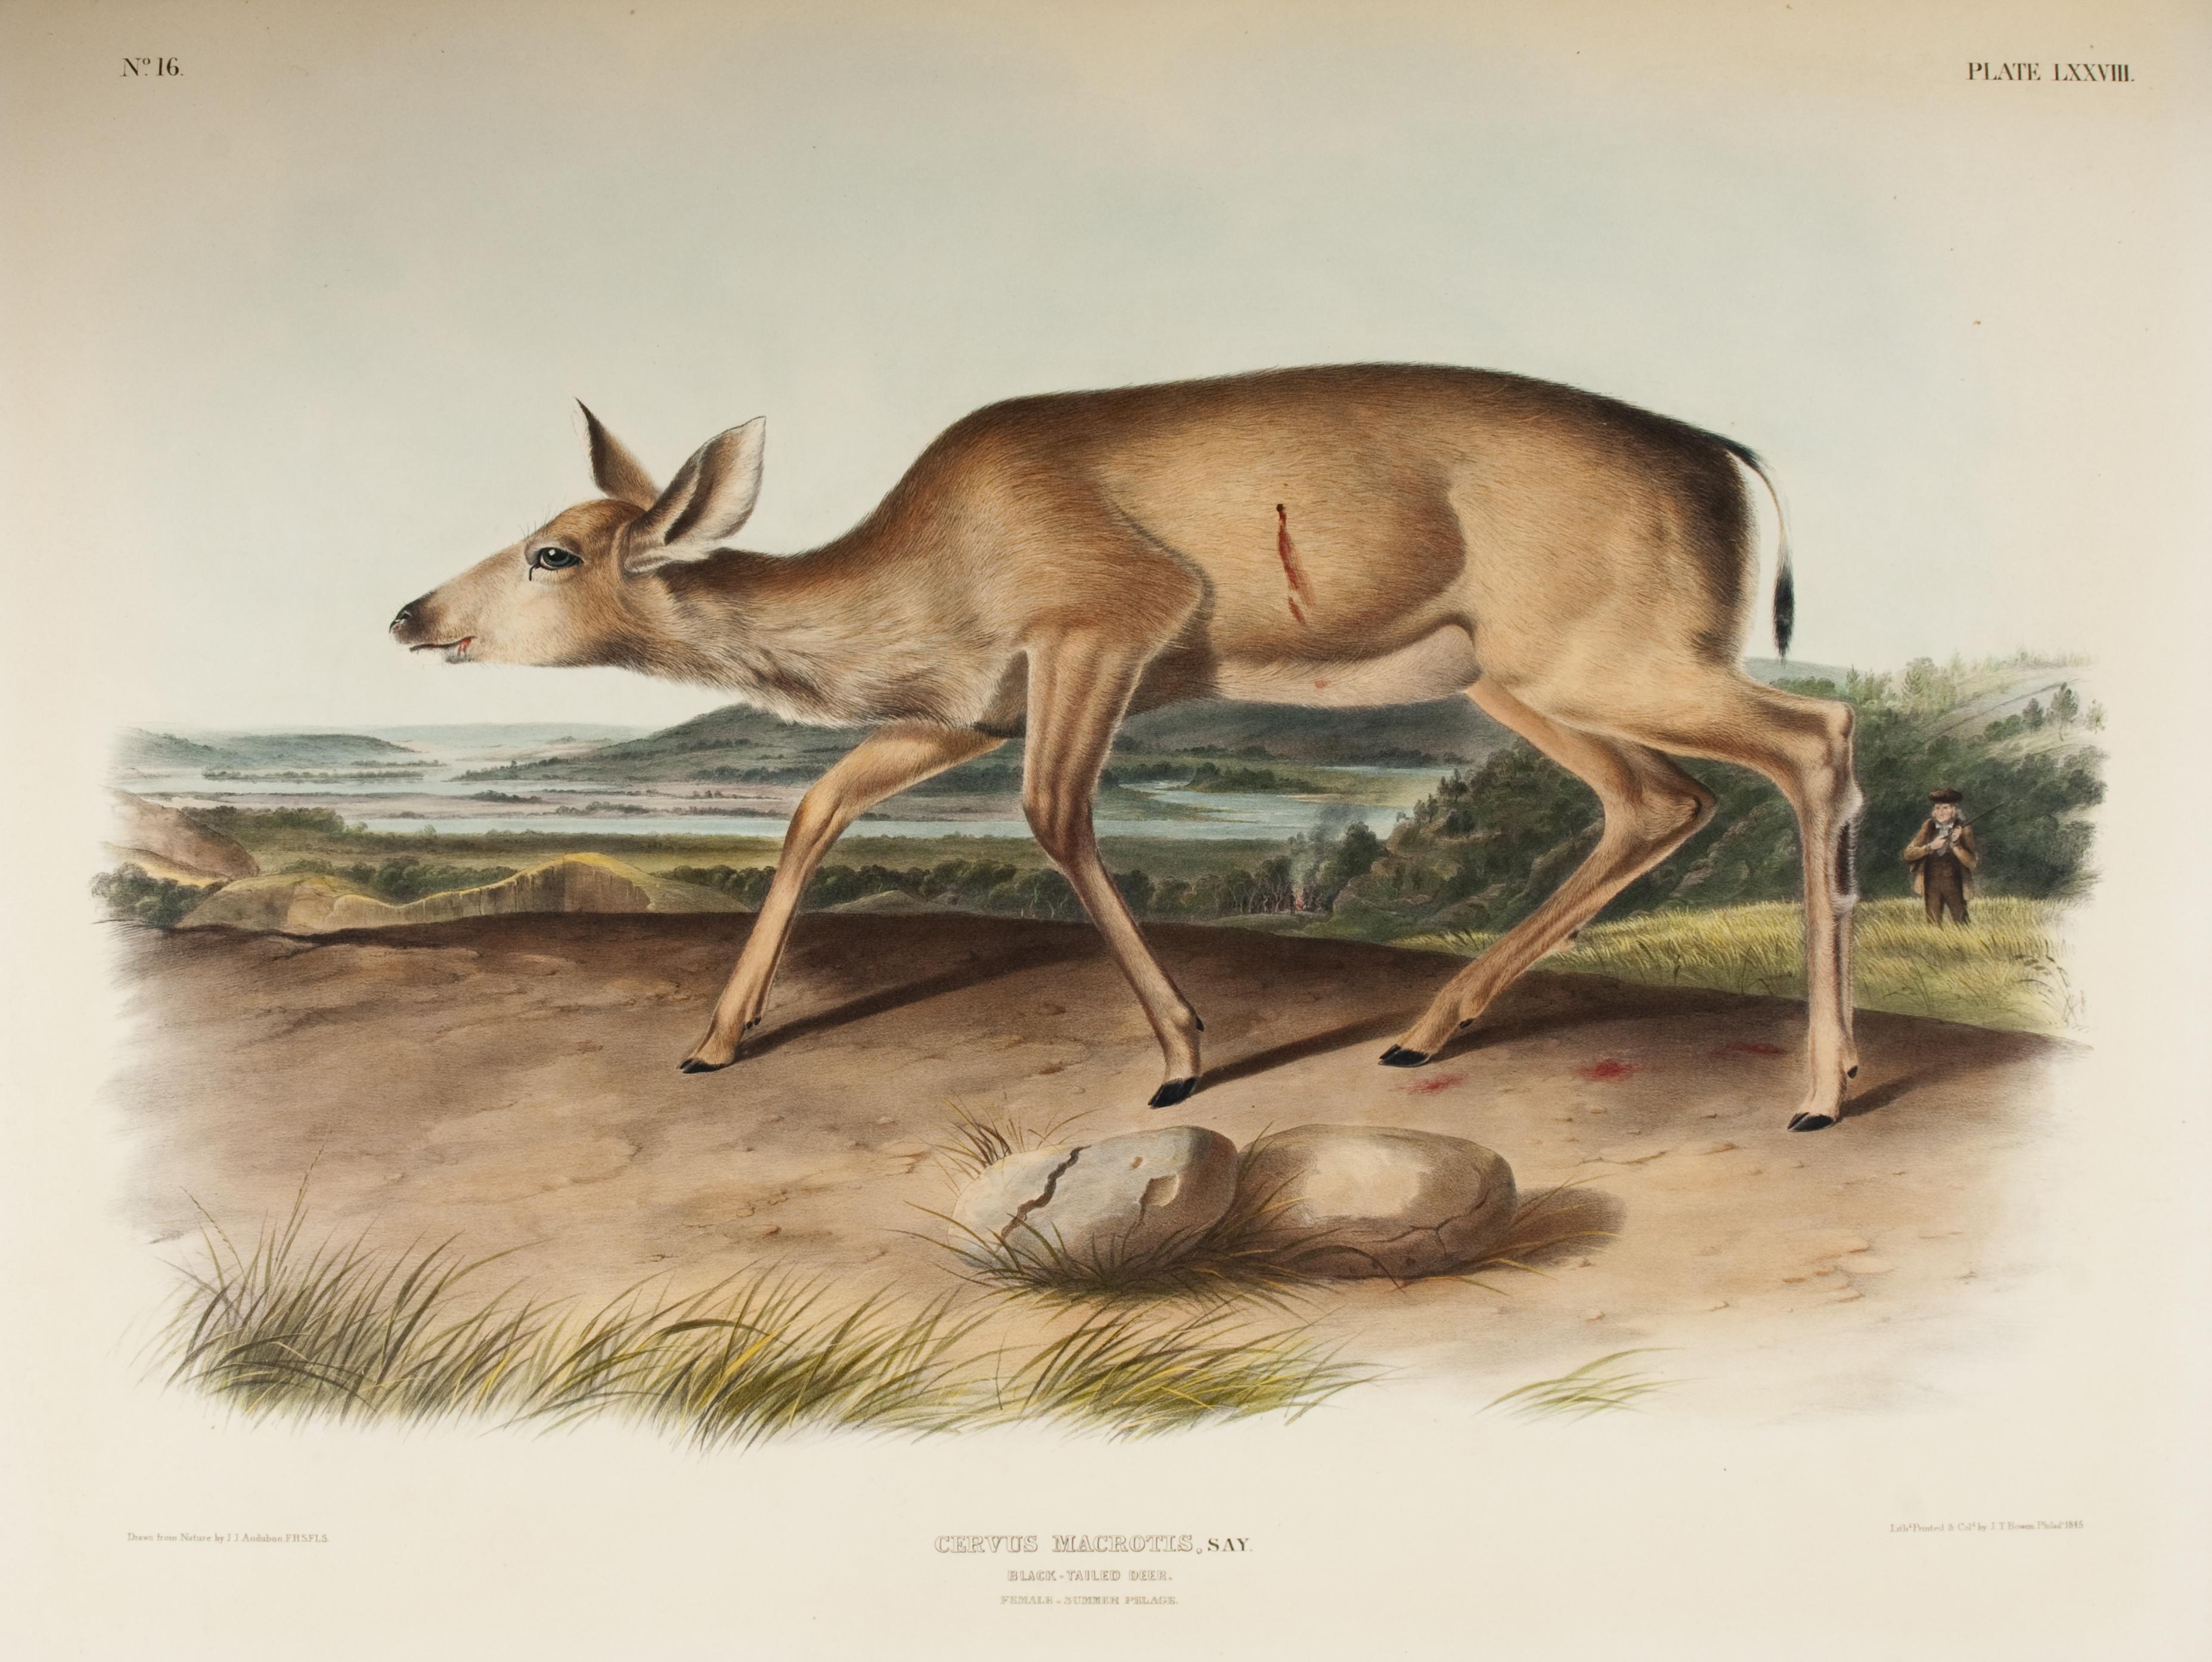 A deer in a woodland landscape.